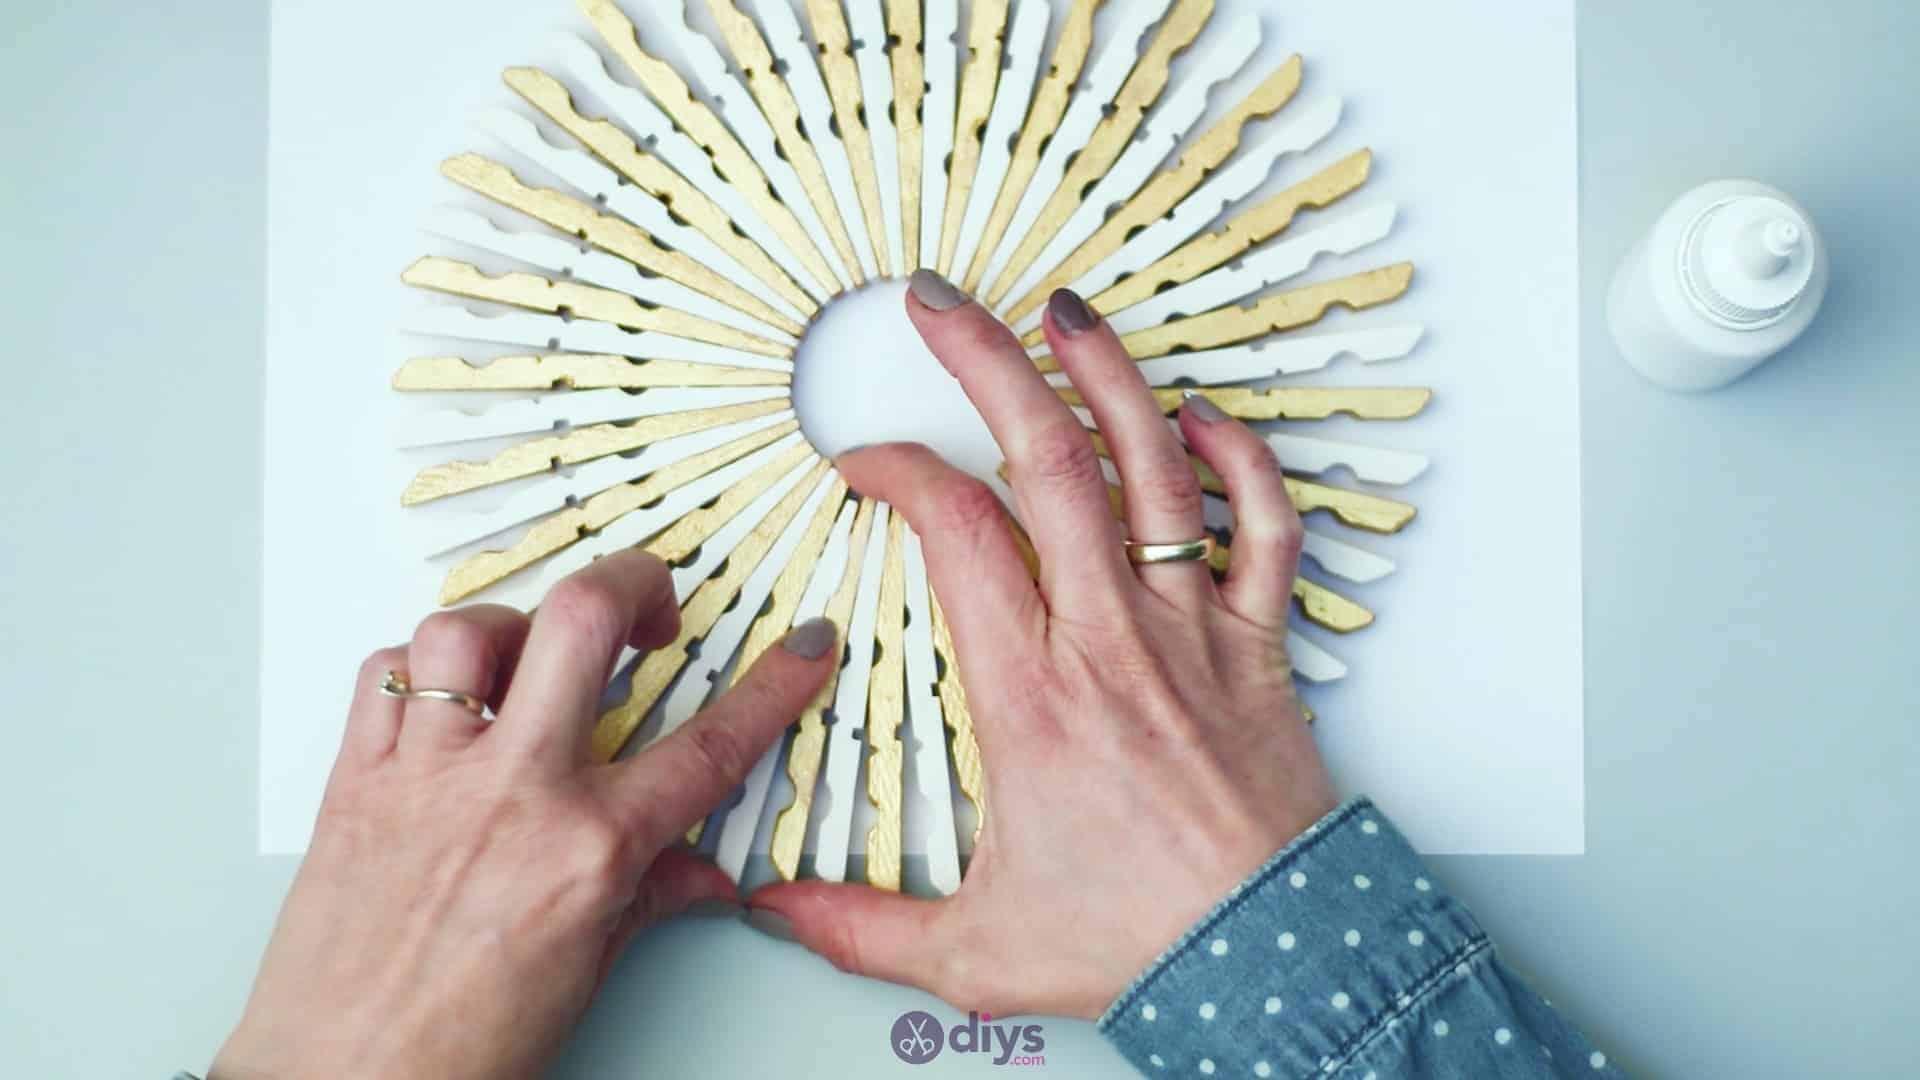 Diy clothespin art step 5n